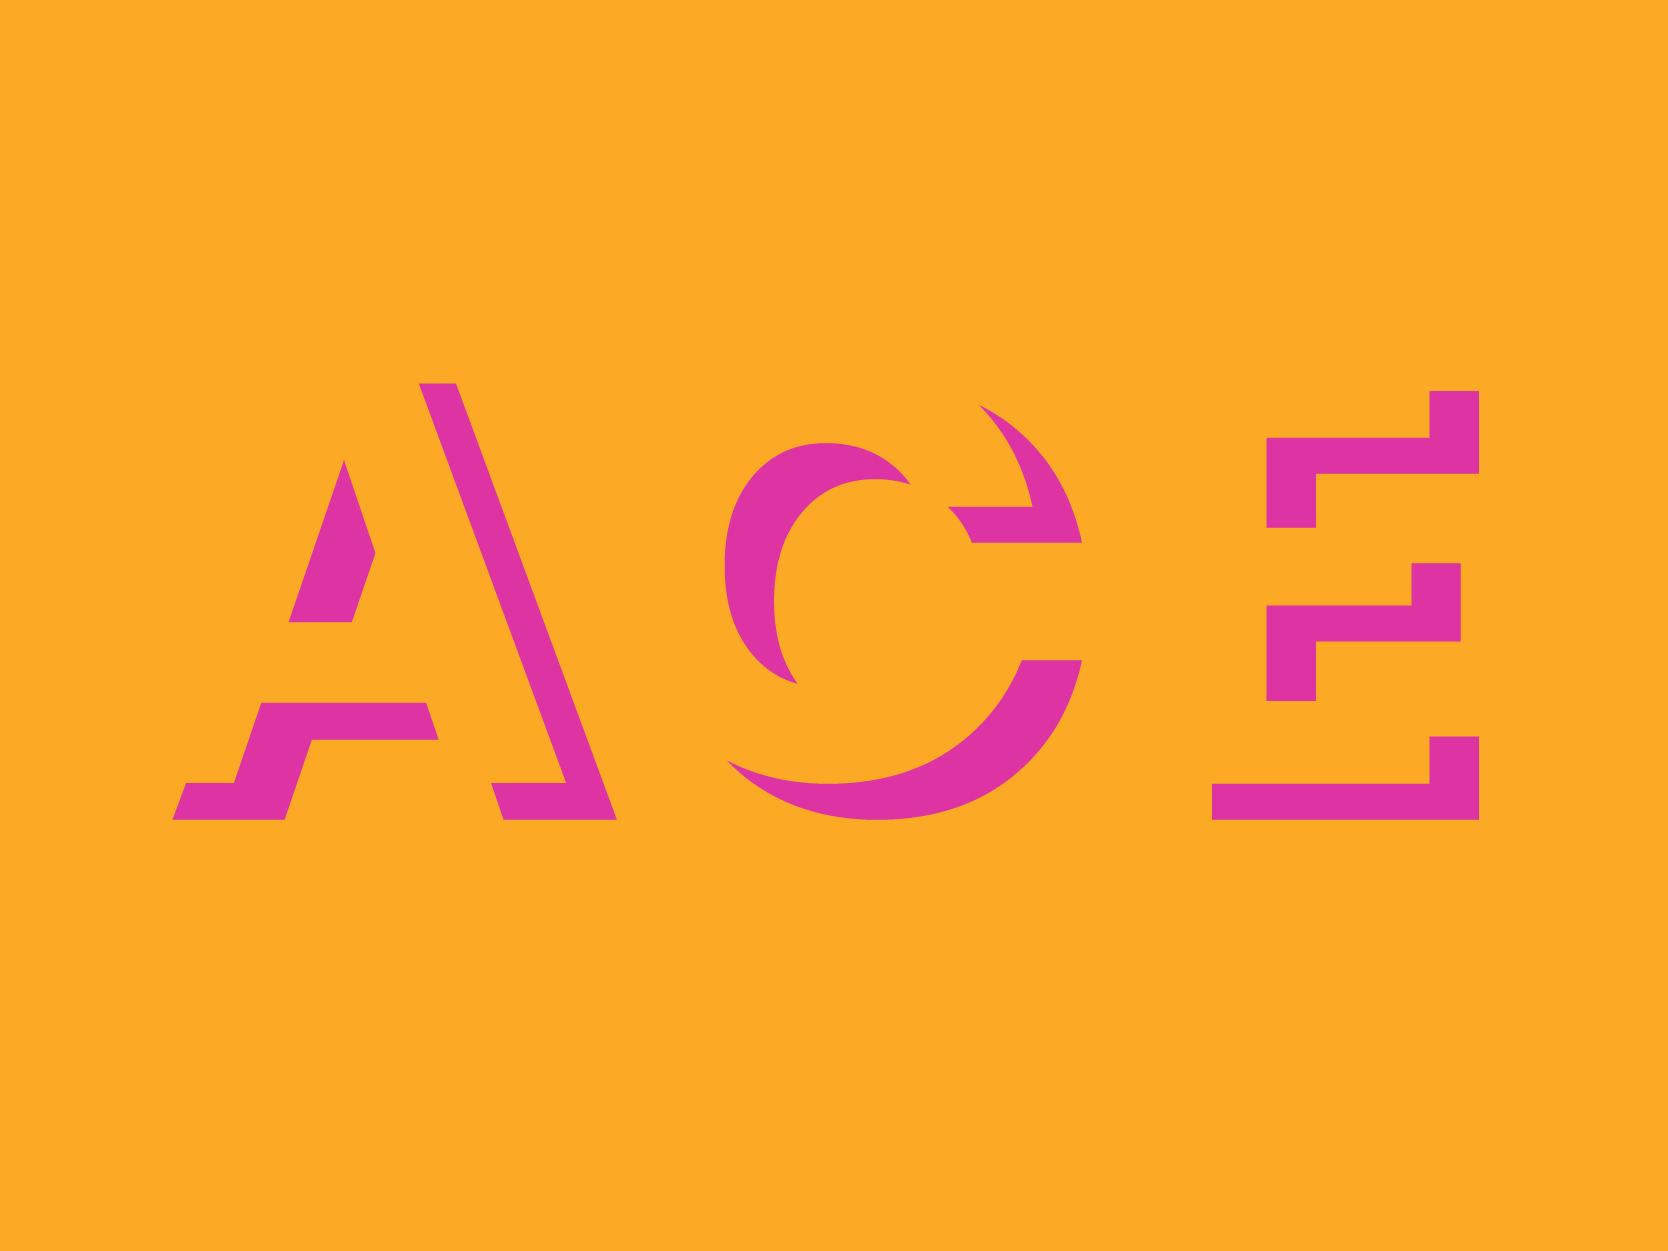 Ace dribbble logo 06